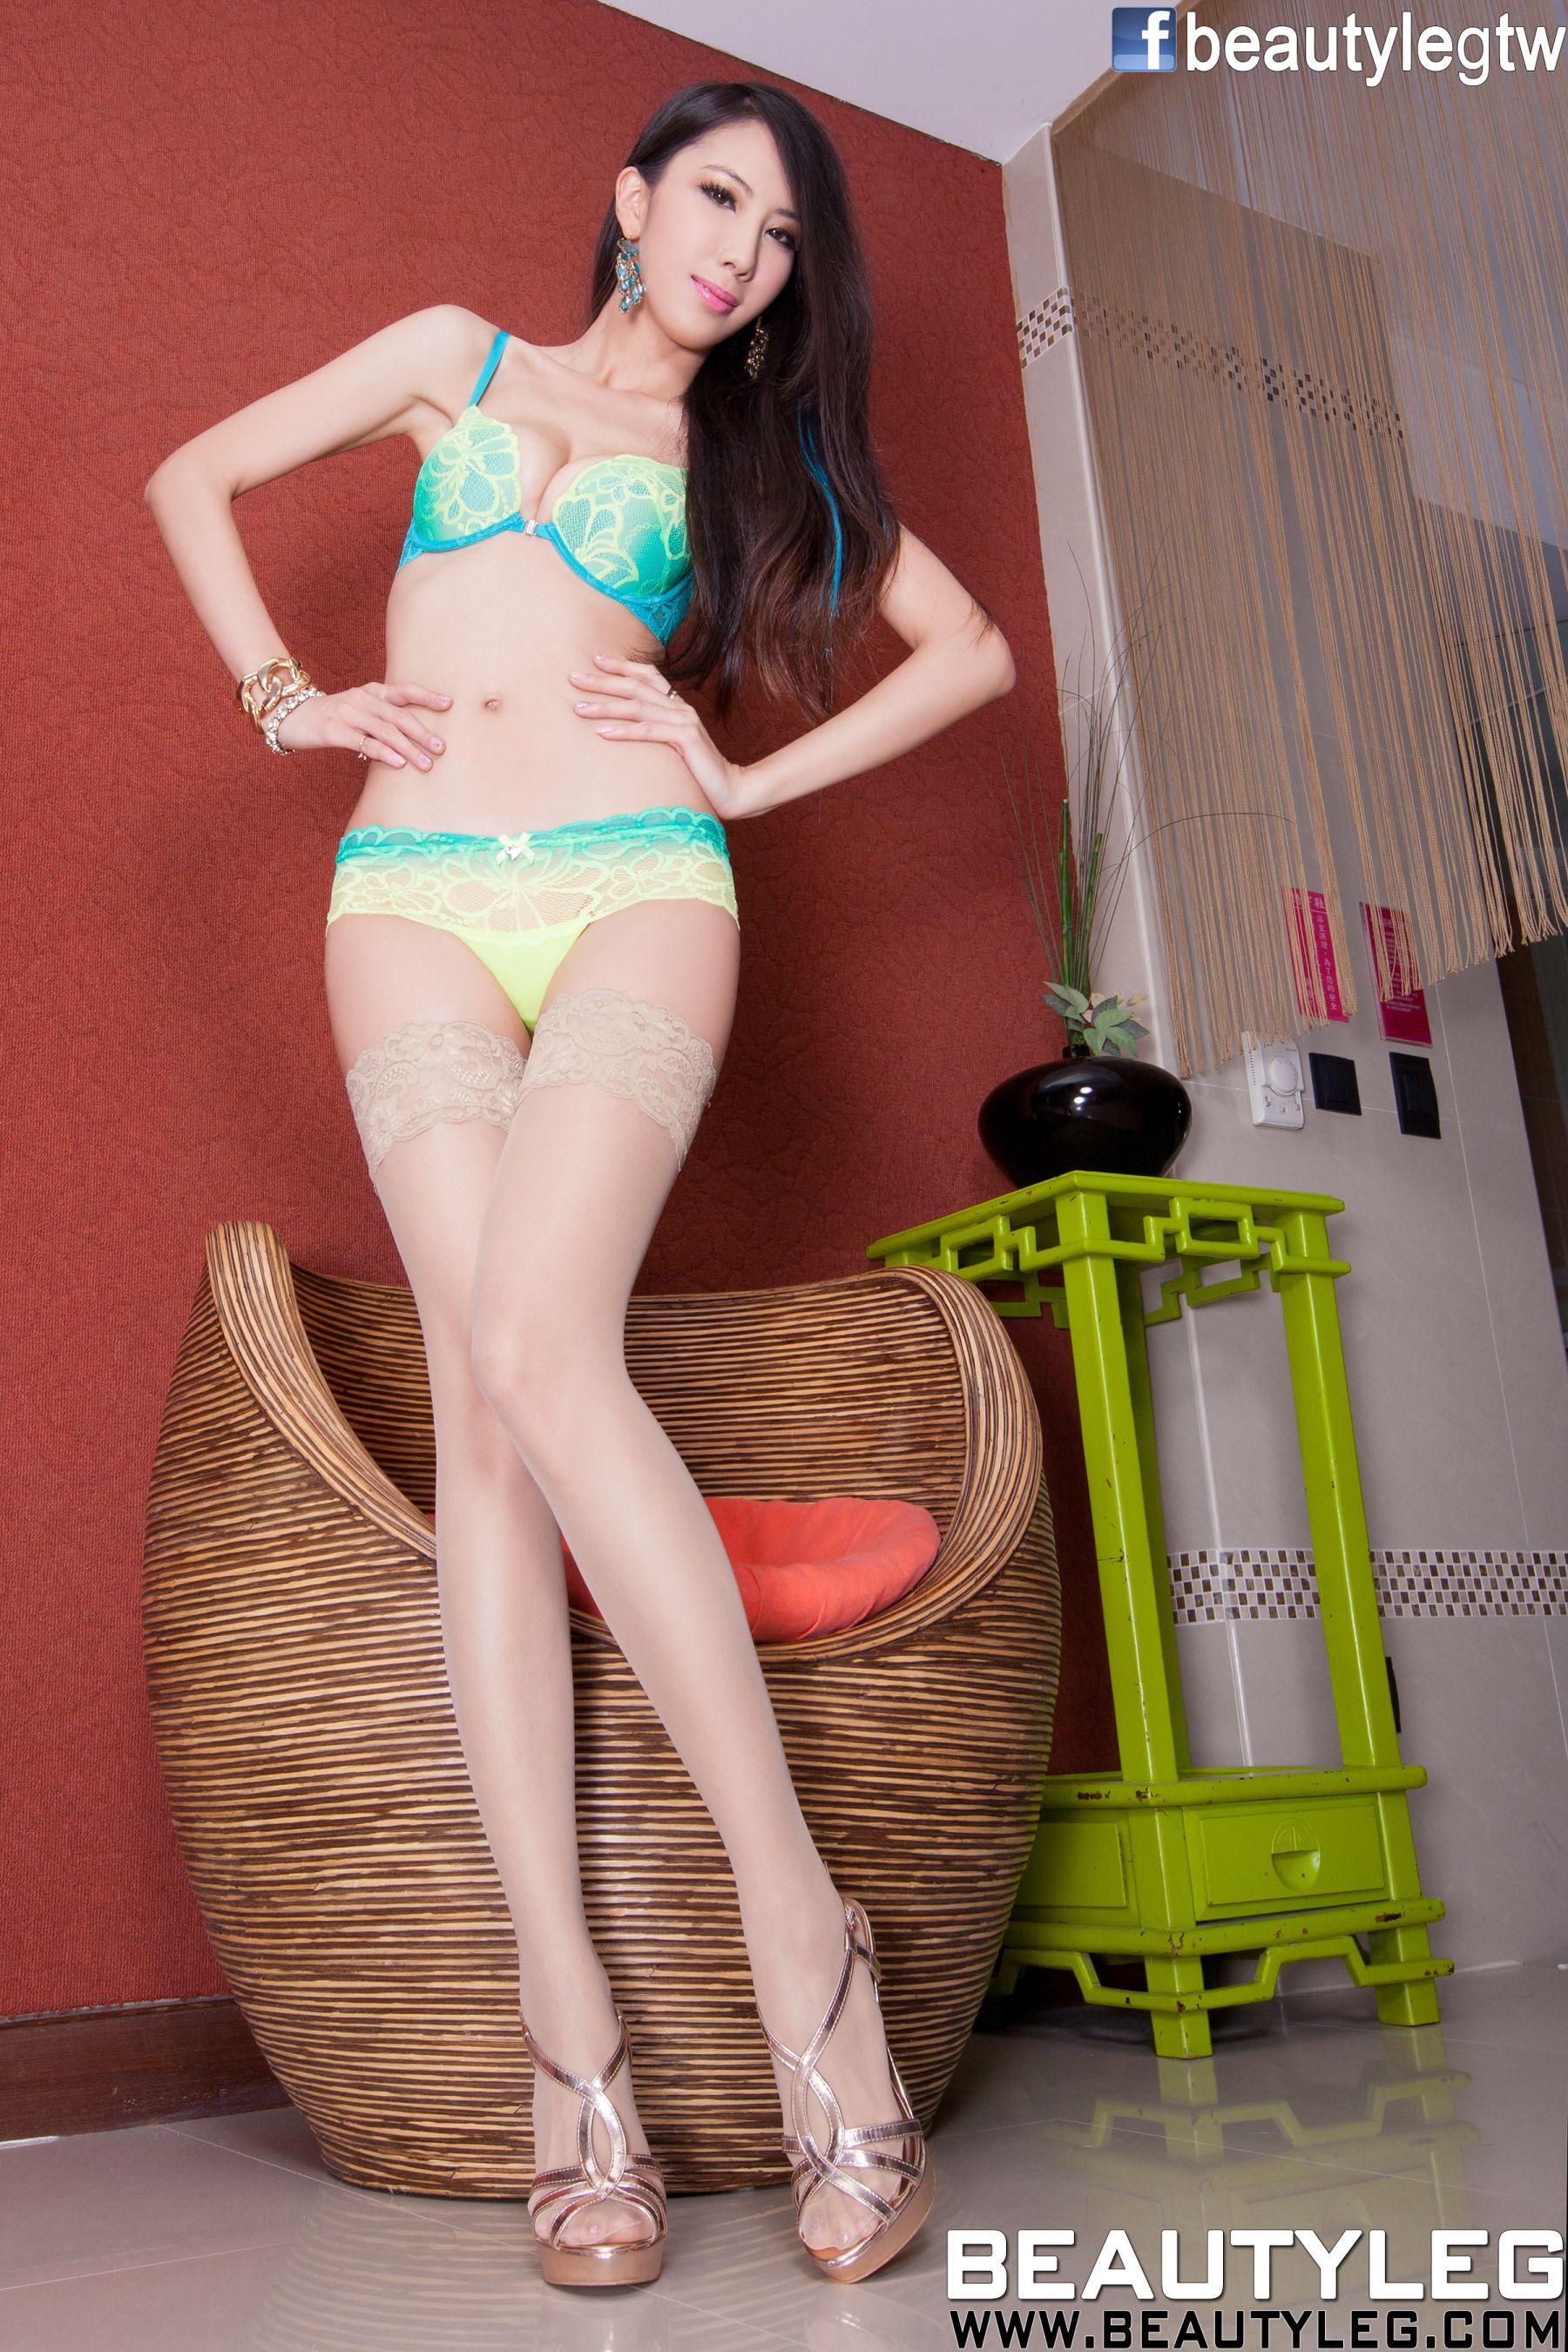 VOL.559 [Beautyleg]紧身裤高跟美腿:童采萱(Beautyleg Yoyo,腿模Yoyo)高品质写真套图(59P)